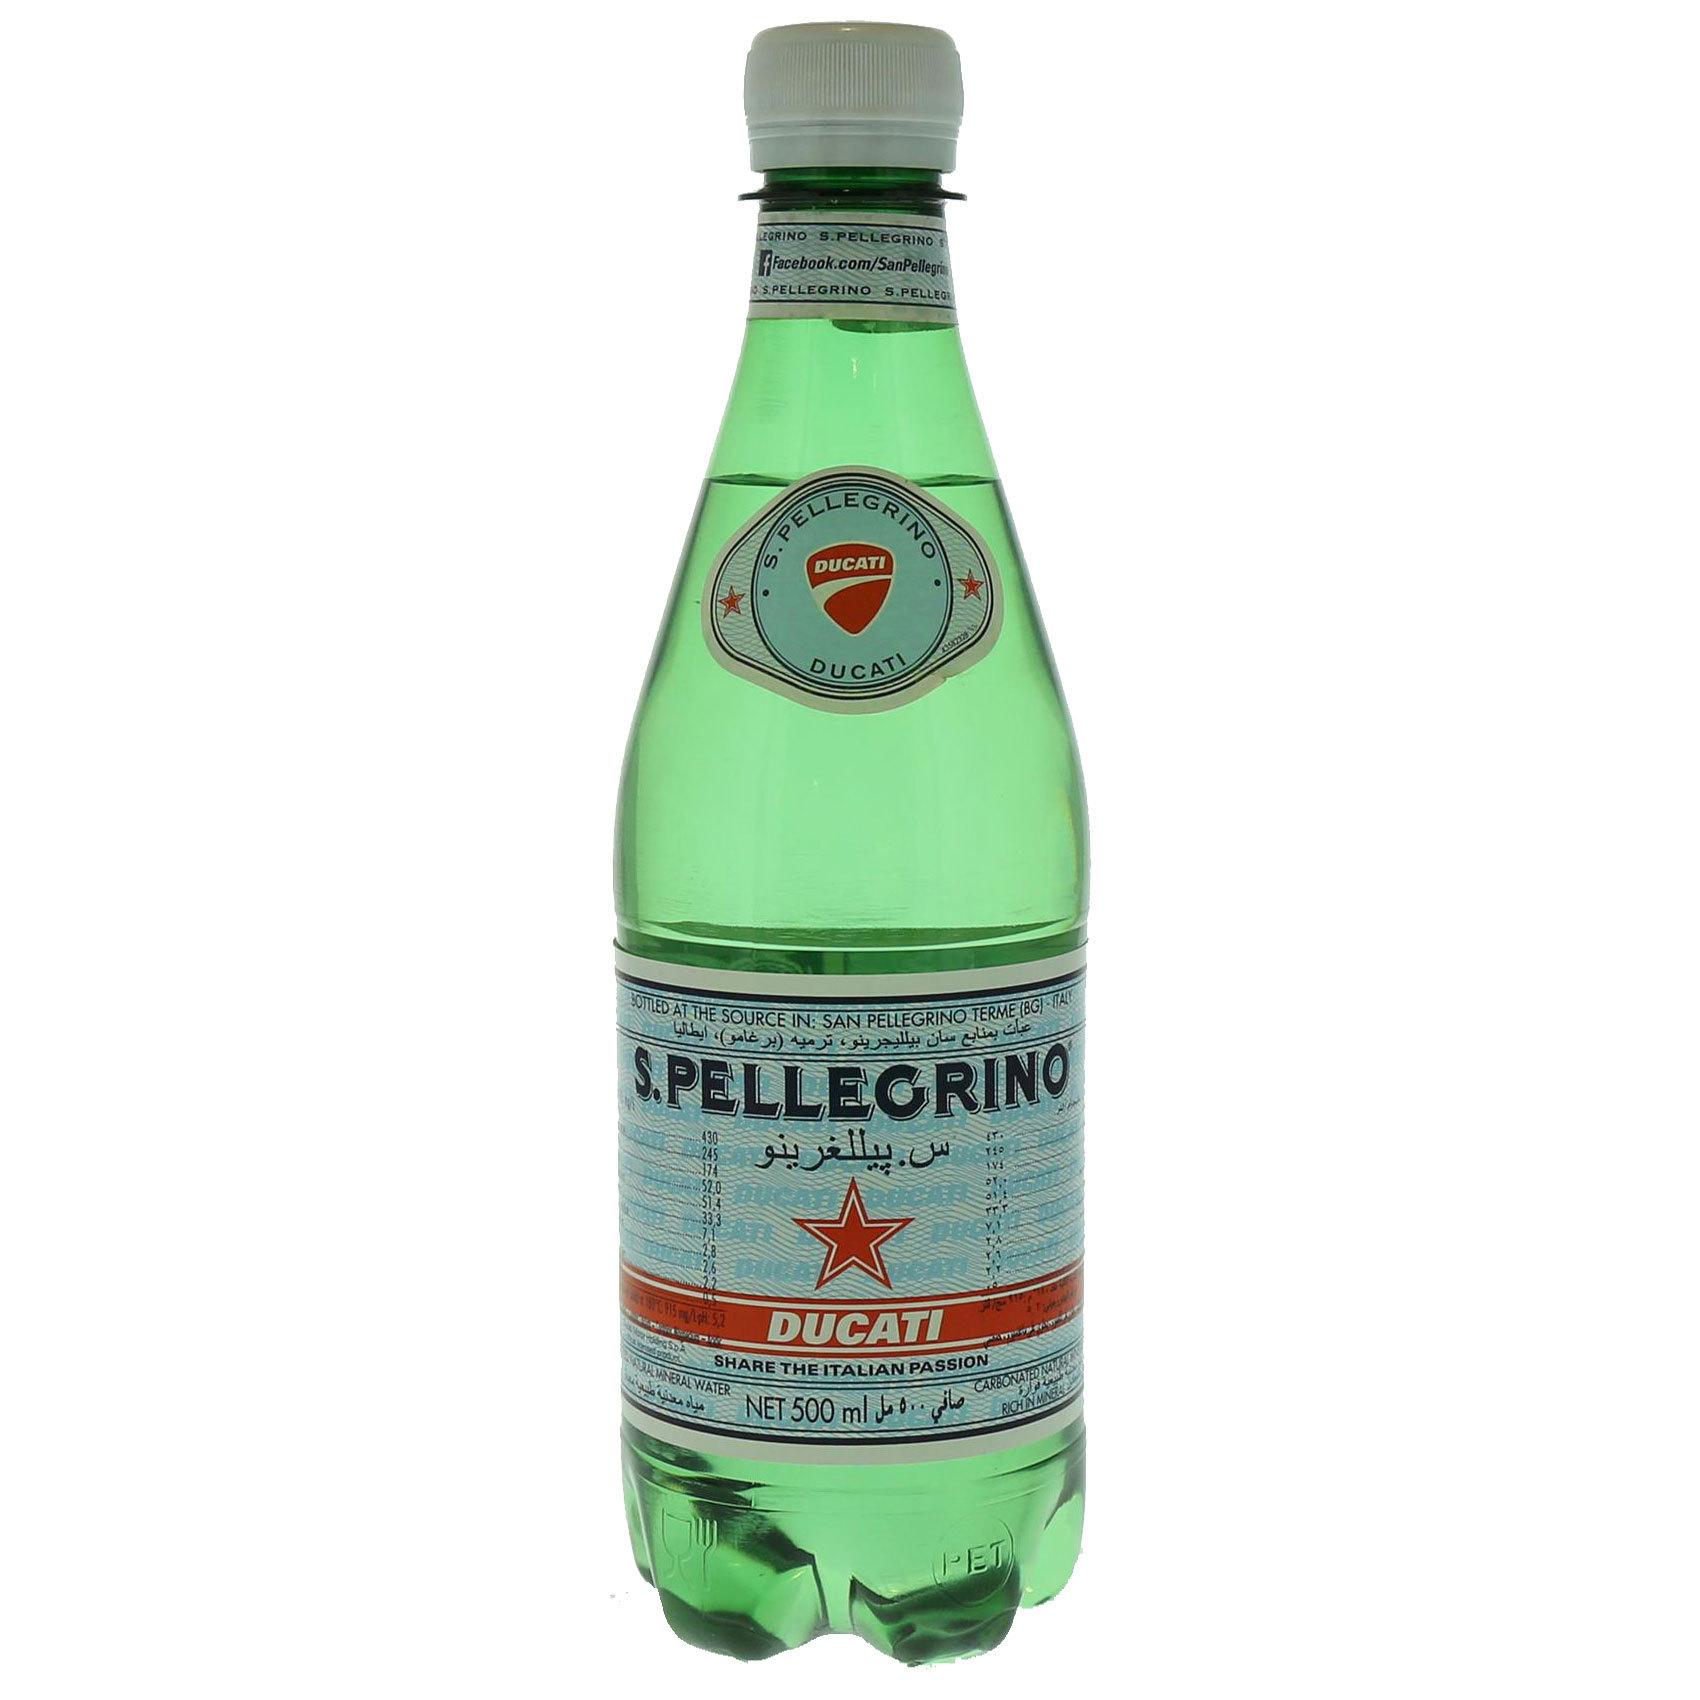 SAN PELLEGRINO SPARK/WATER 0.5L